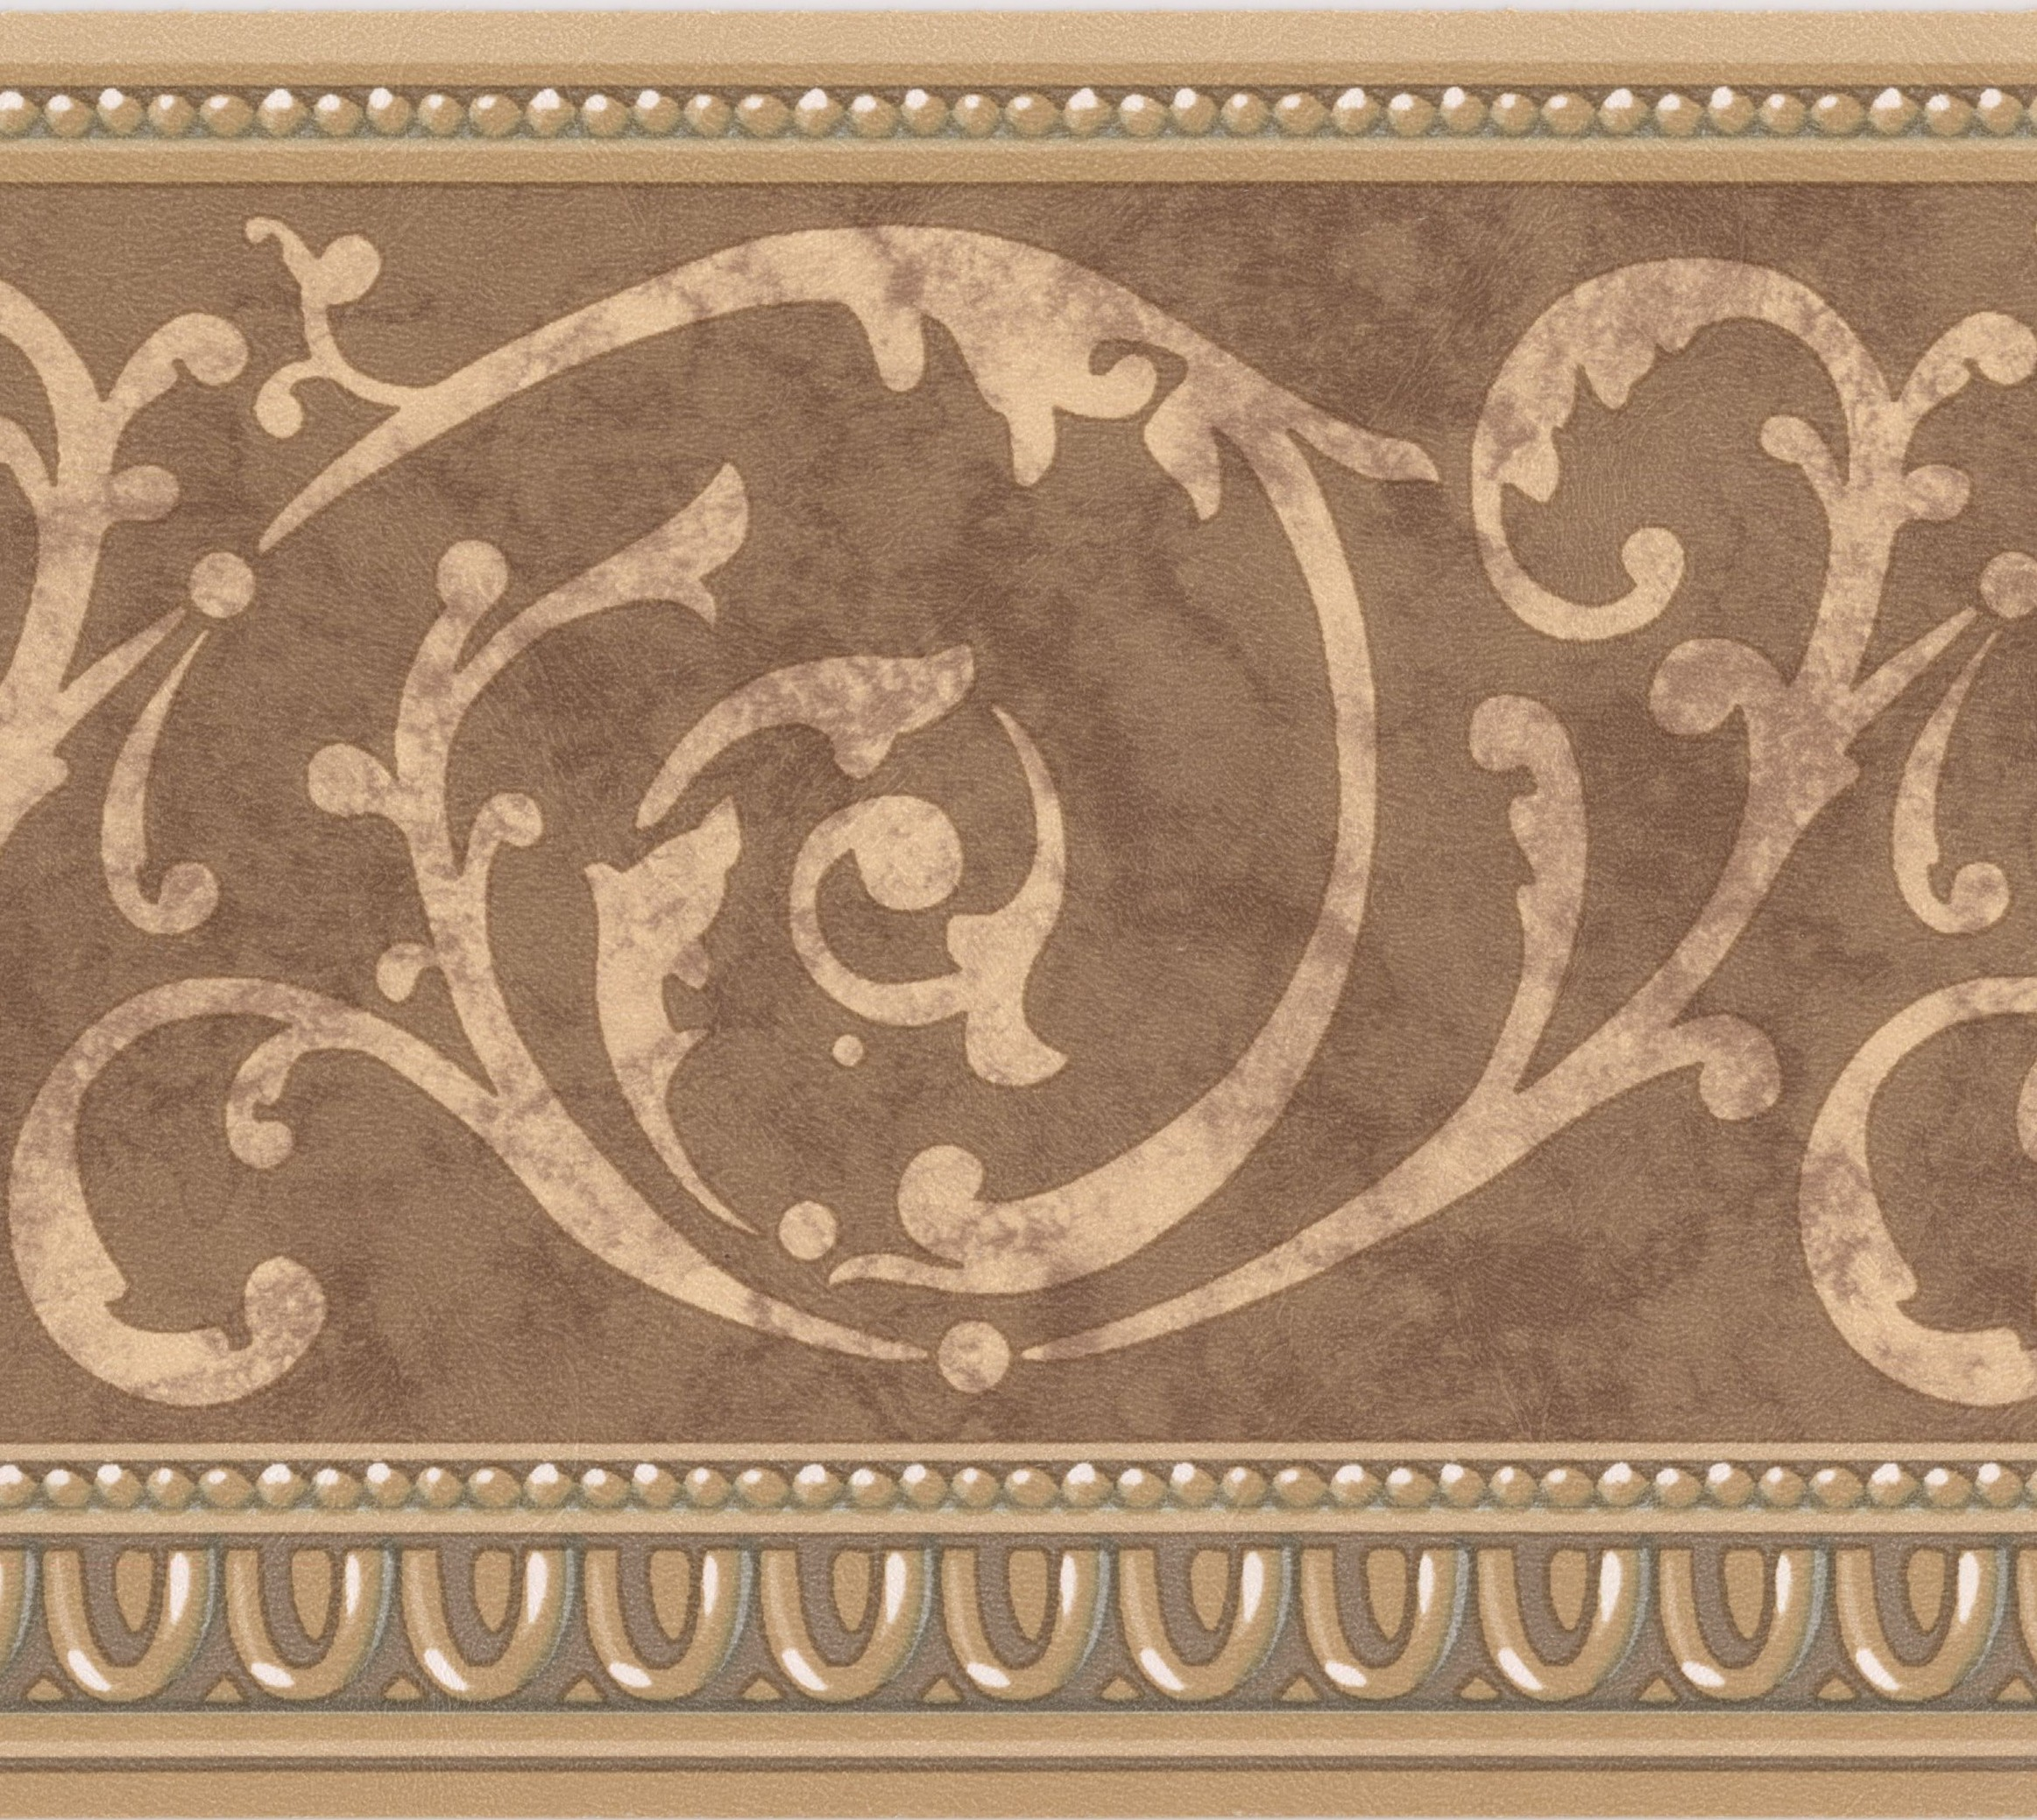 Wallpaper Border - Beige Vines Brown Damask Classic Wall ...